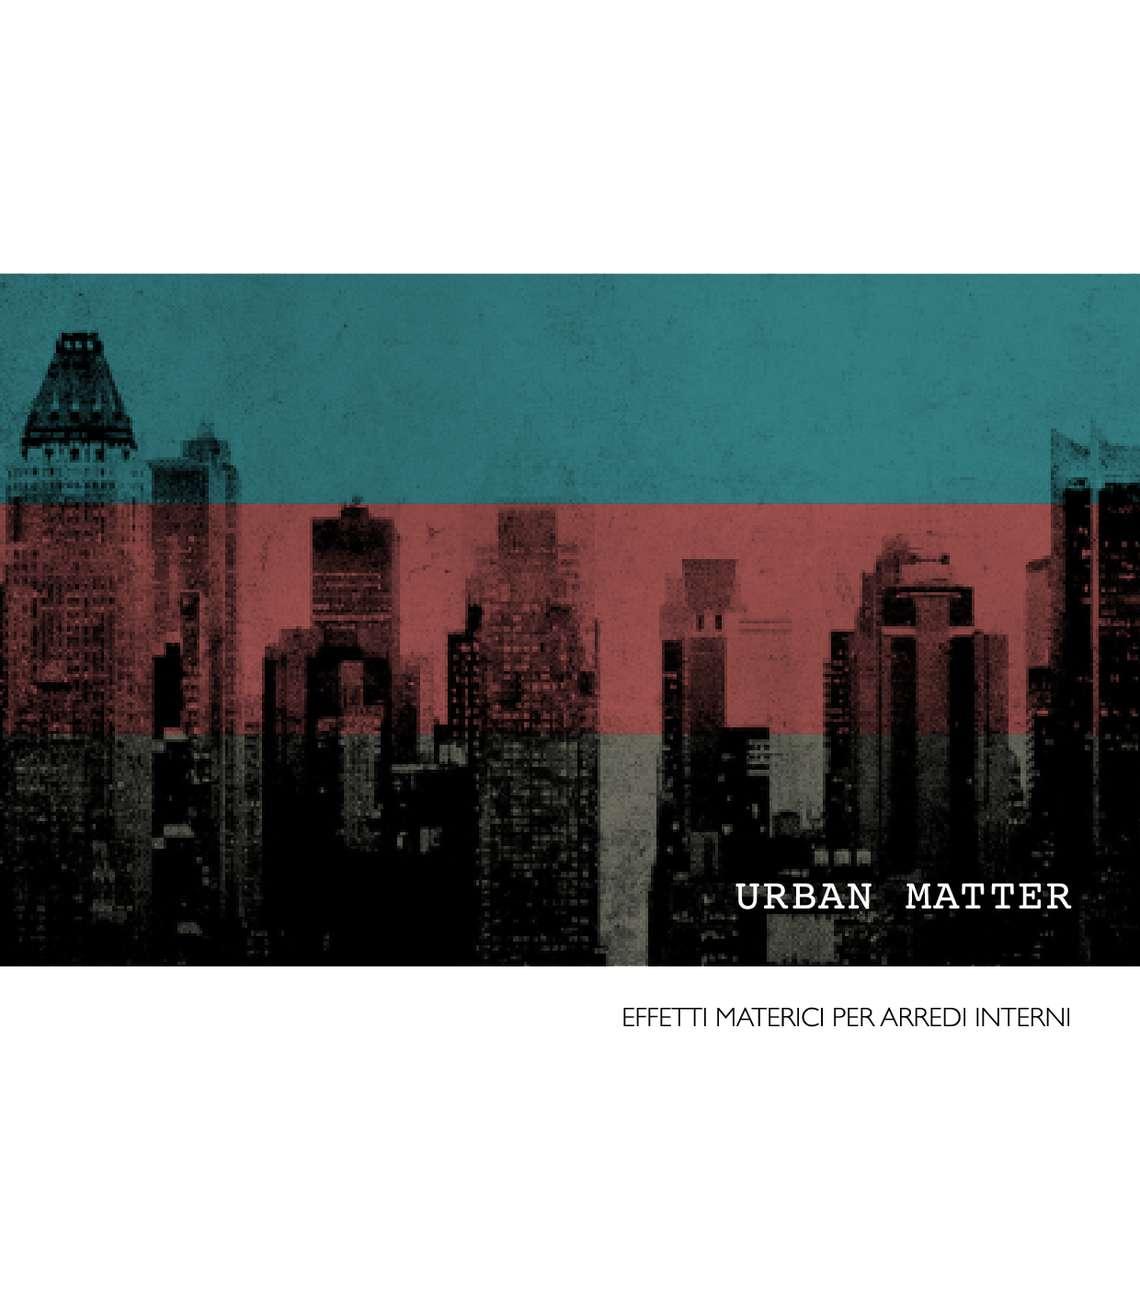 Urban Matter - Effetti materici per arredi interni